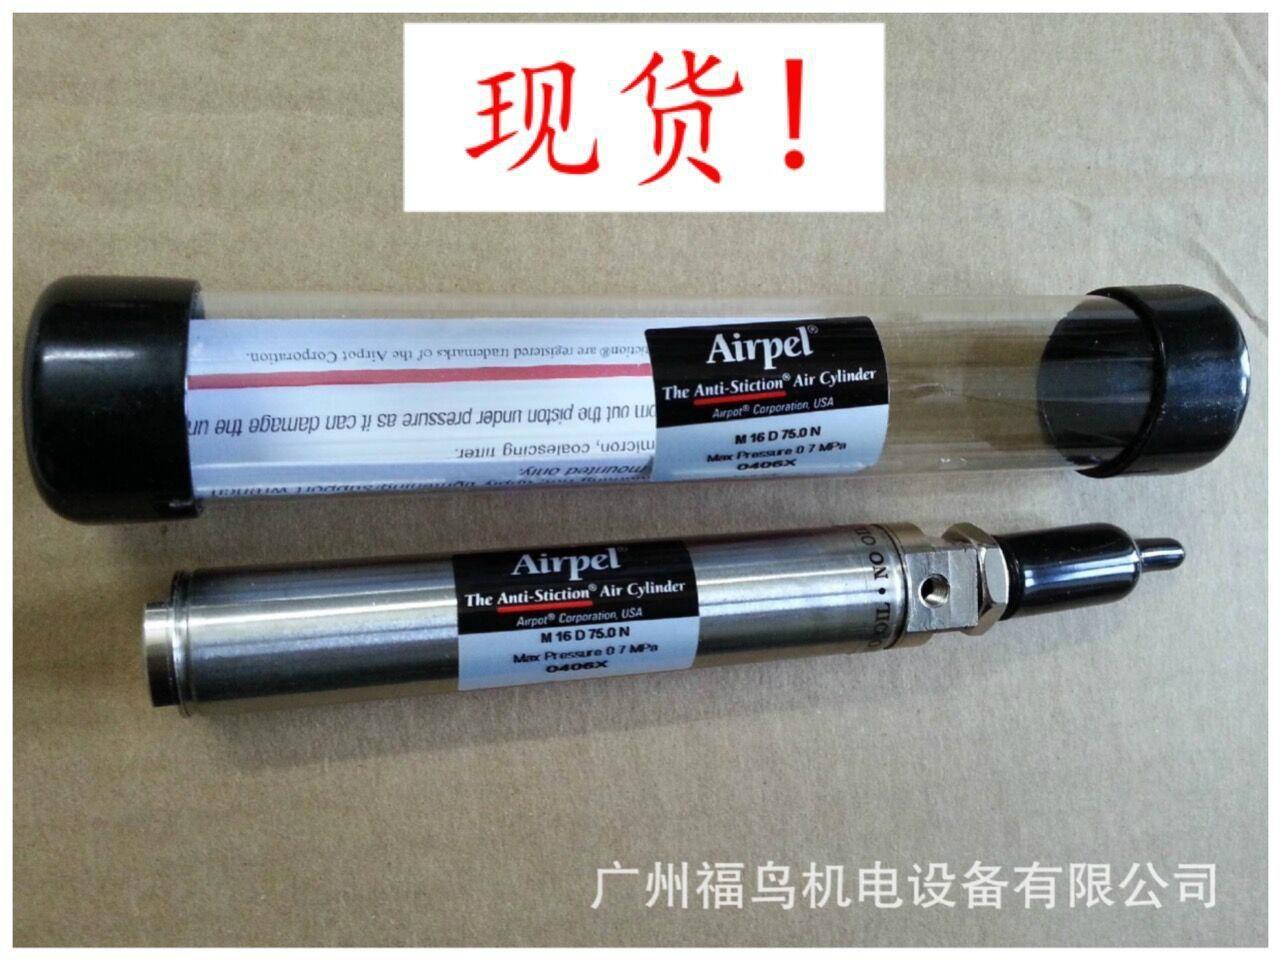 ?AIRPEL / AIRPOT玻璃气缸, 型号: M16D75.0N